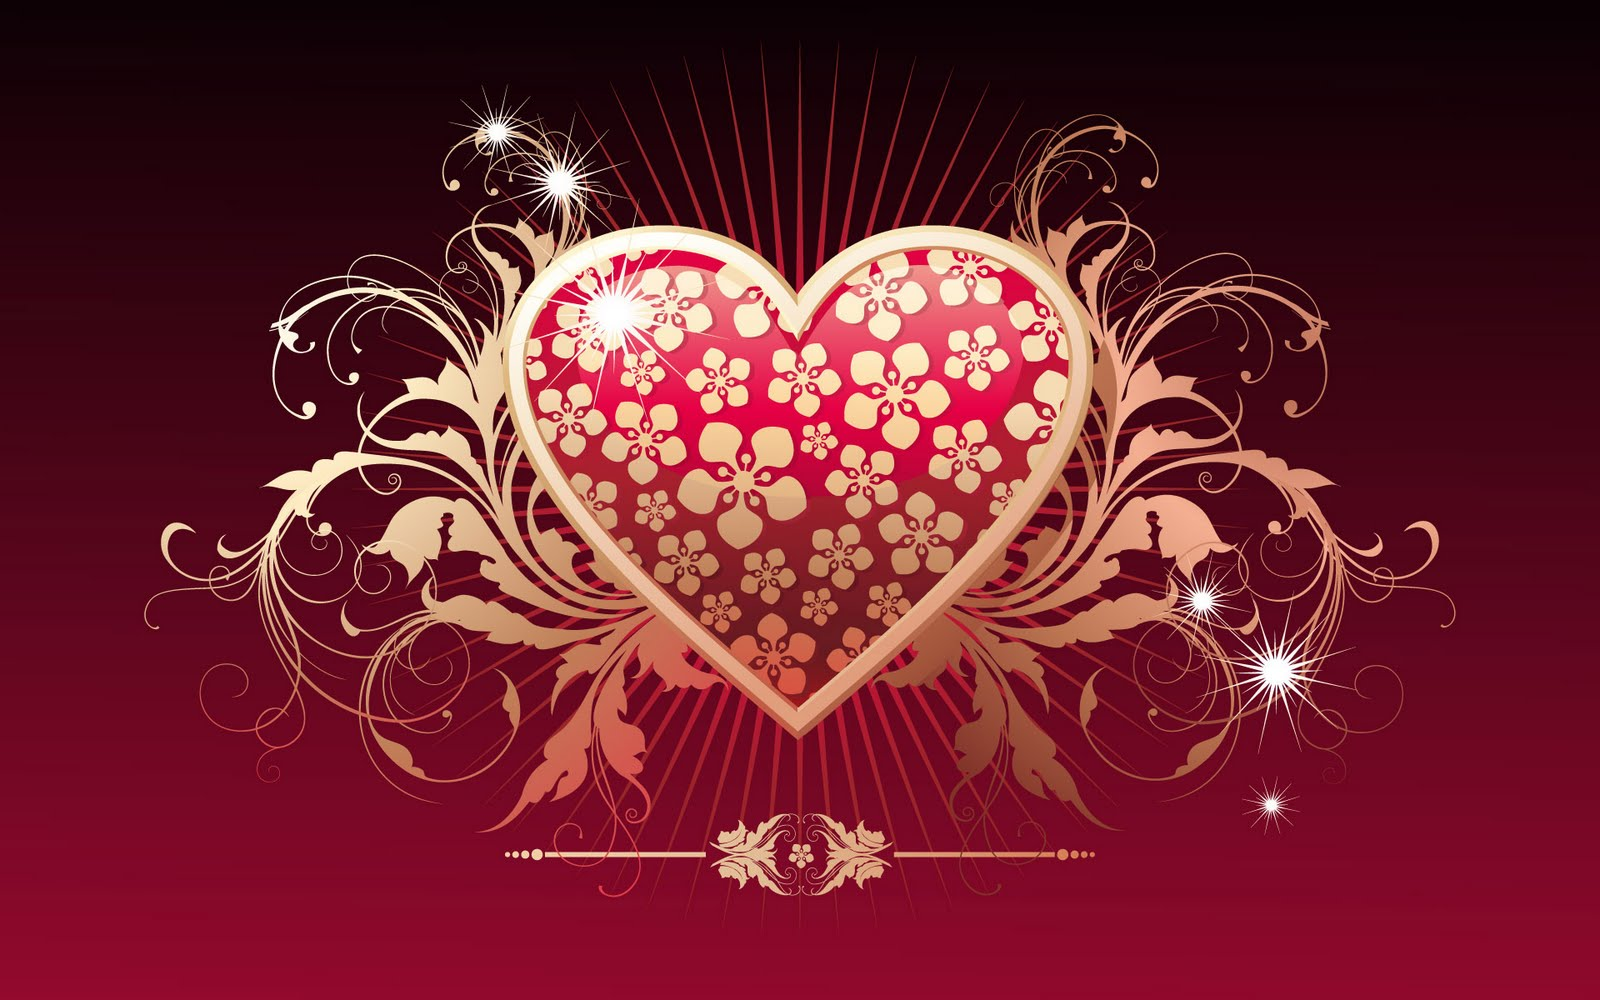 http://2.bp.blogspot.com/-PSCvS_fs3sk/Tivxljb3EgI/AAAAAAAAL-E/sJIs1lO77r0/s1600/Mooie-romantische-achtergronden-hd-leuke-romantische-wallpapers-17.jpg